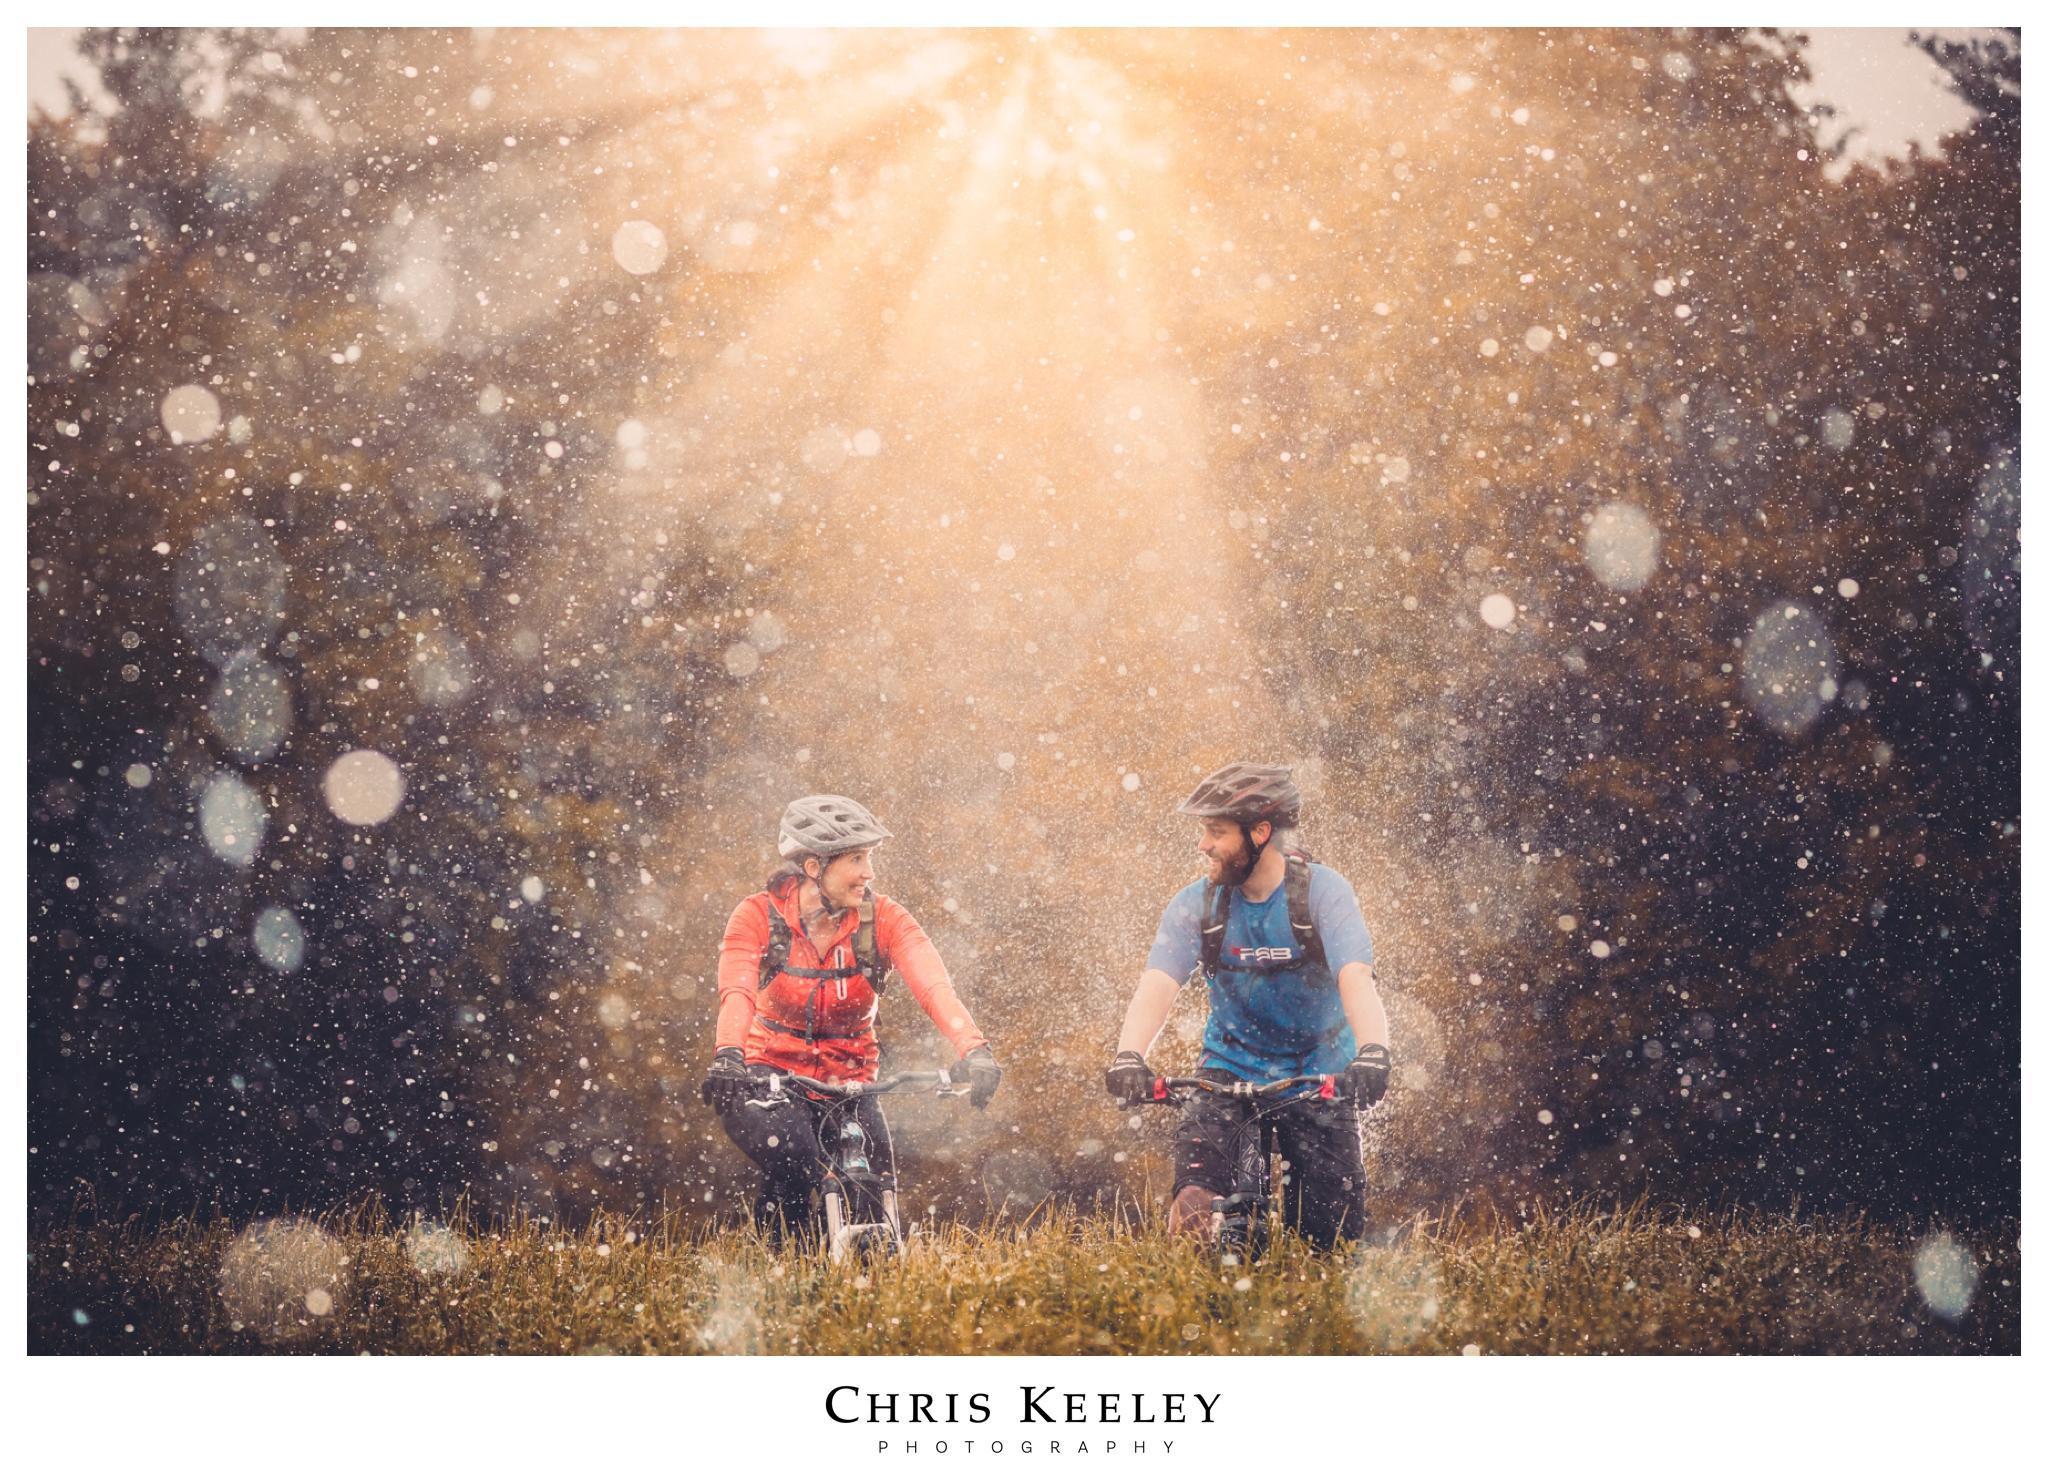 35-Jennings-Everts-Chris-Keeley-Photography.jpg